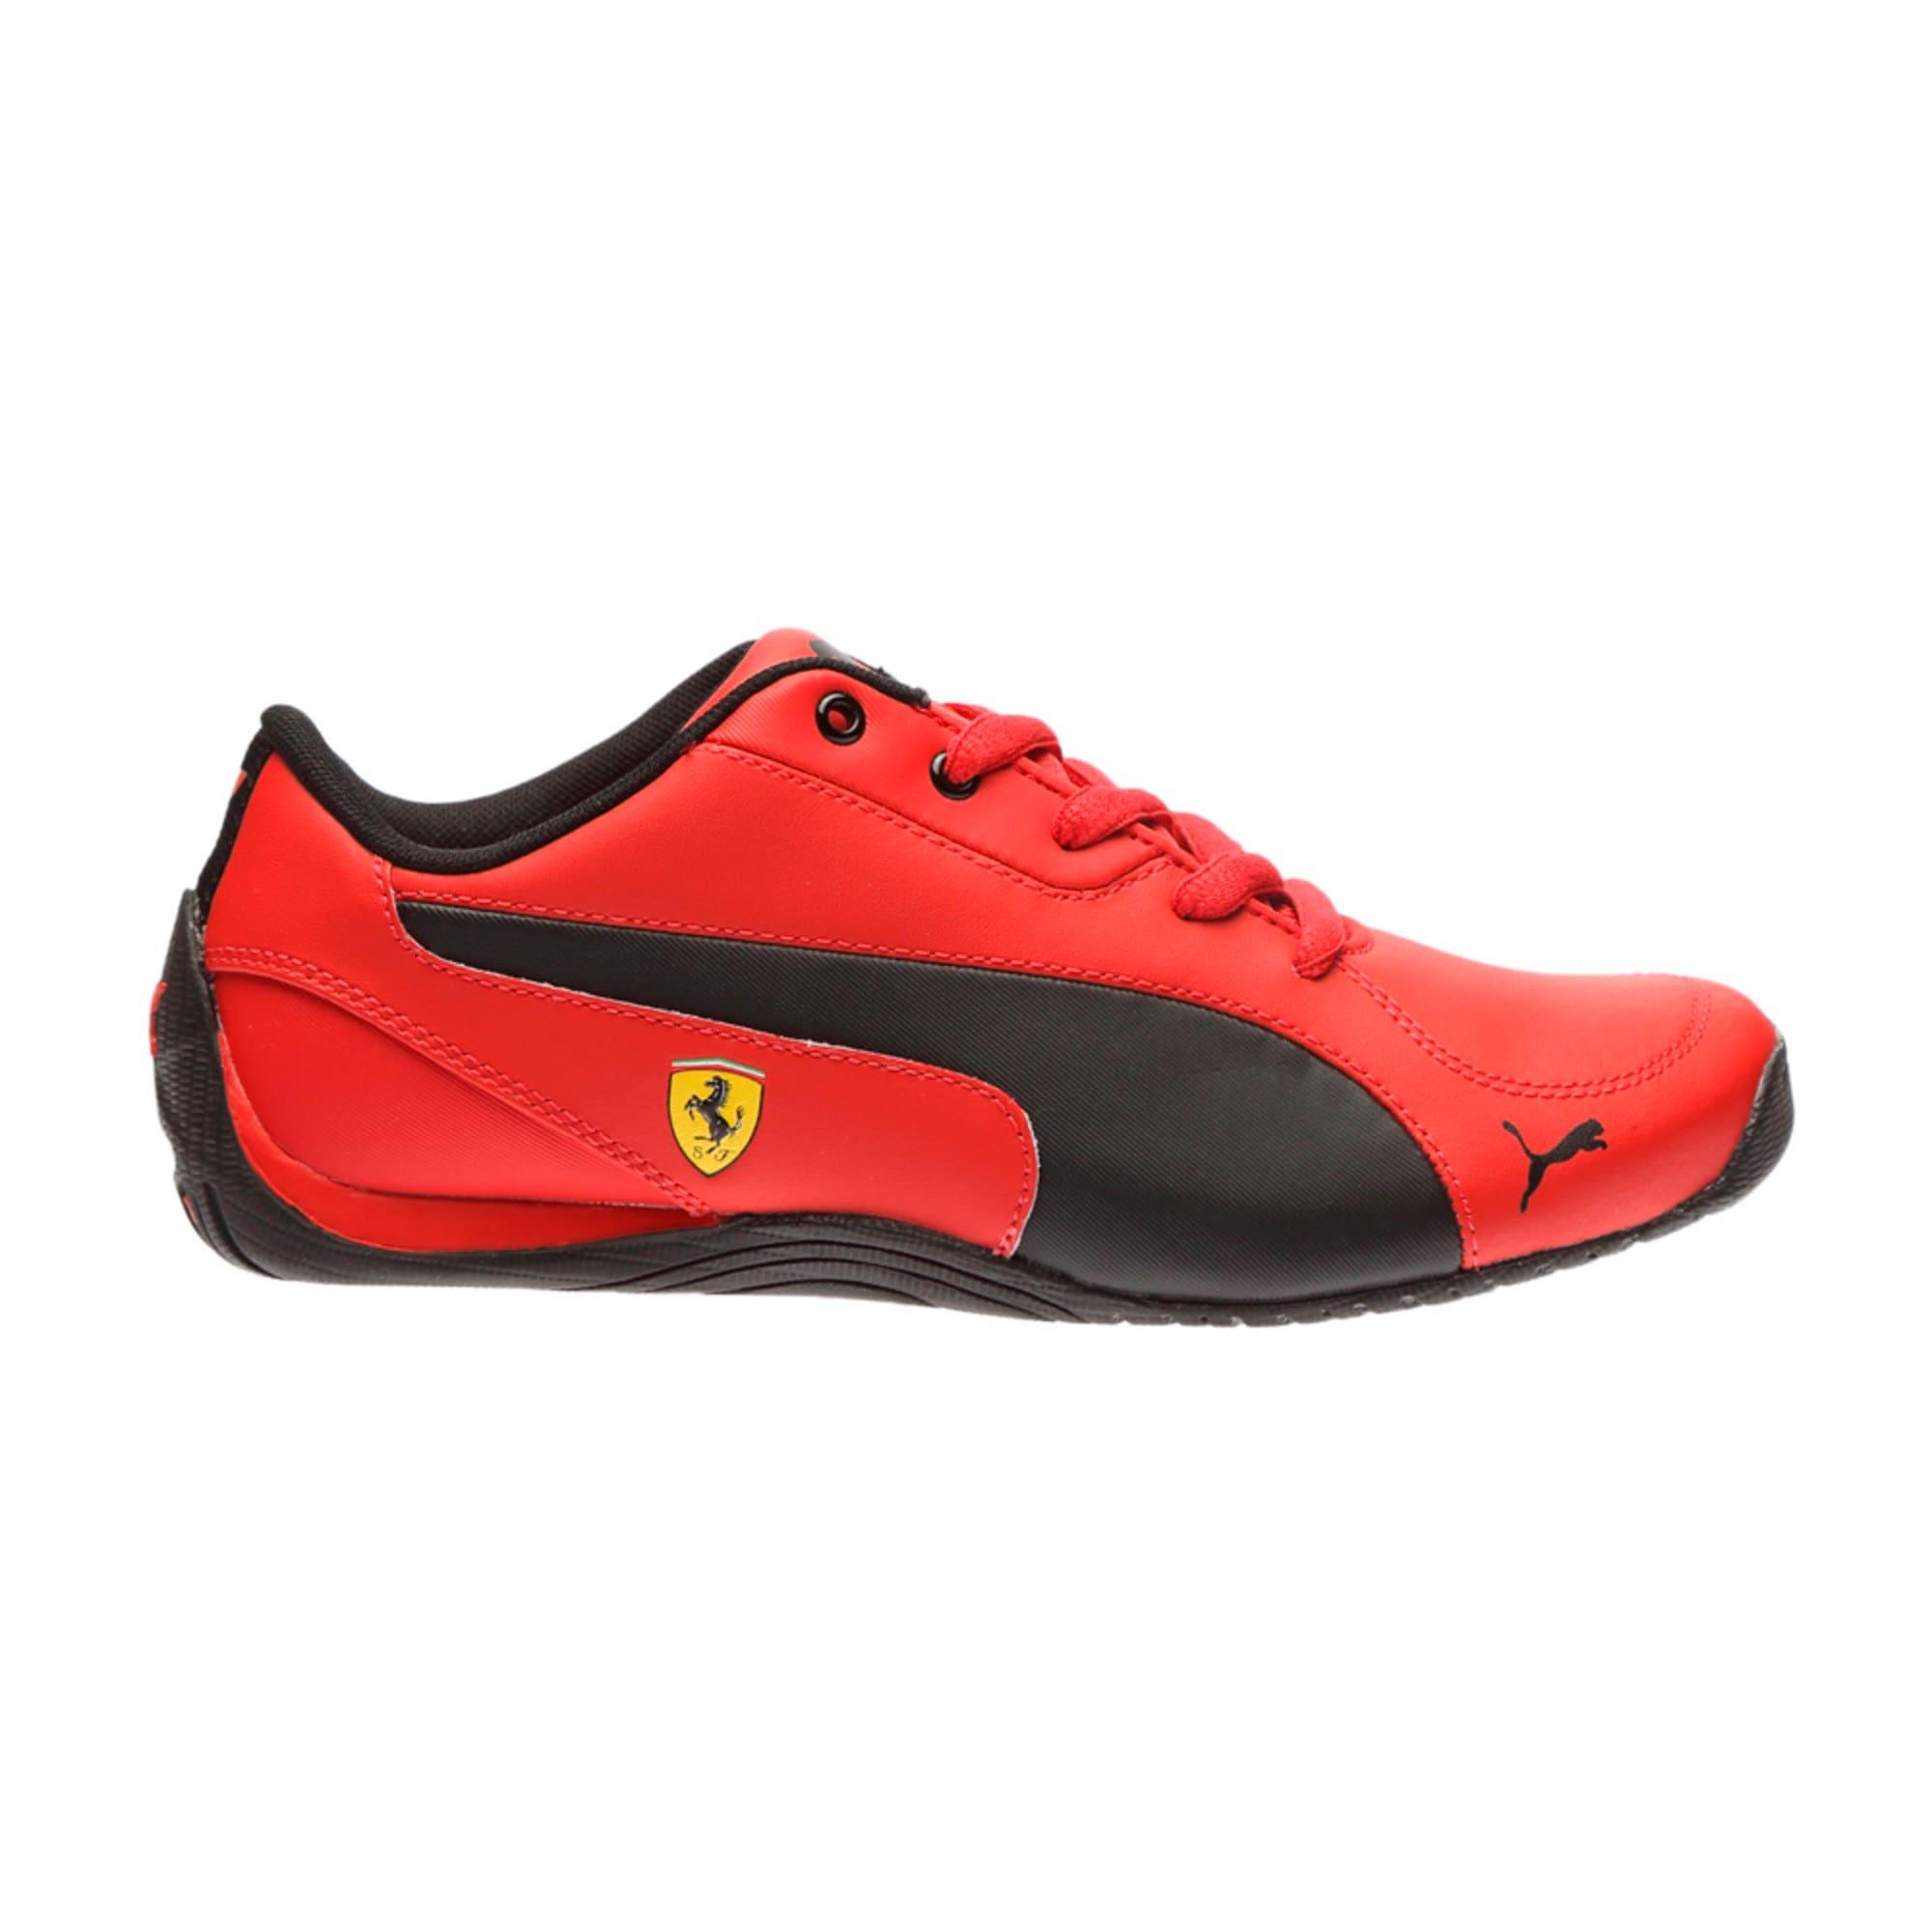 Thumbnail 5 of Ferrari Drift Cat 5 Jr. Trainers, Rosso Corsa-Puma Black, medium-IND